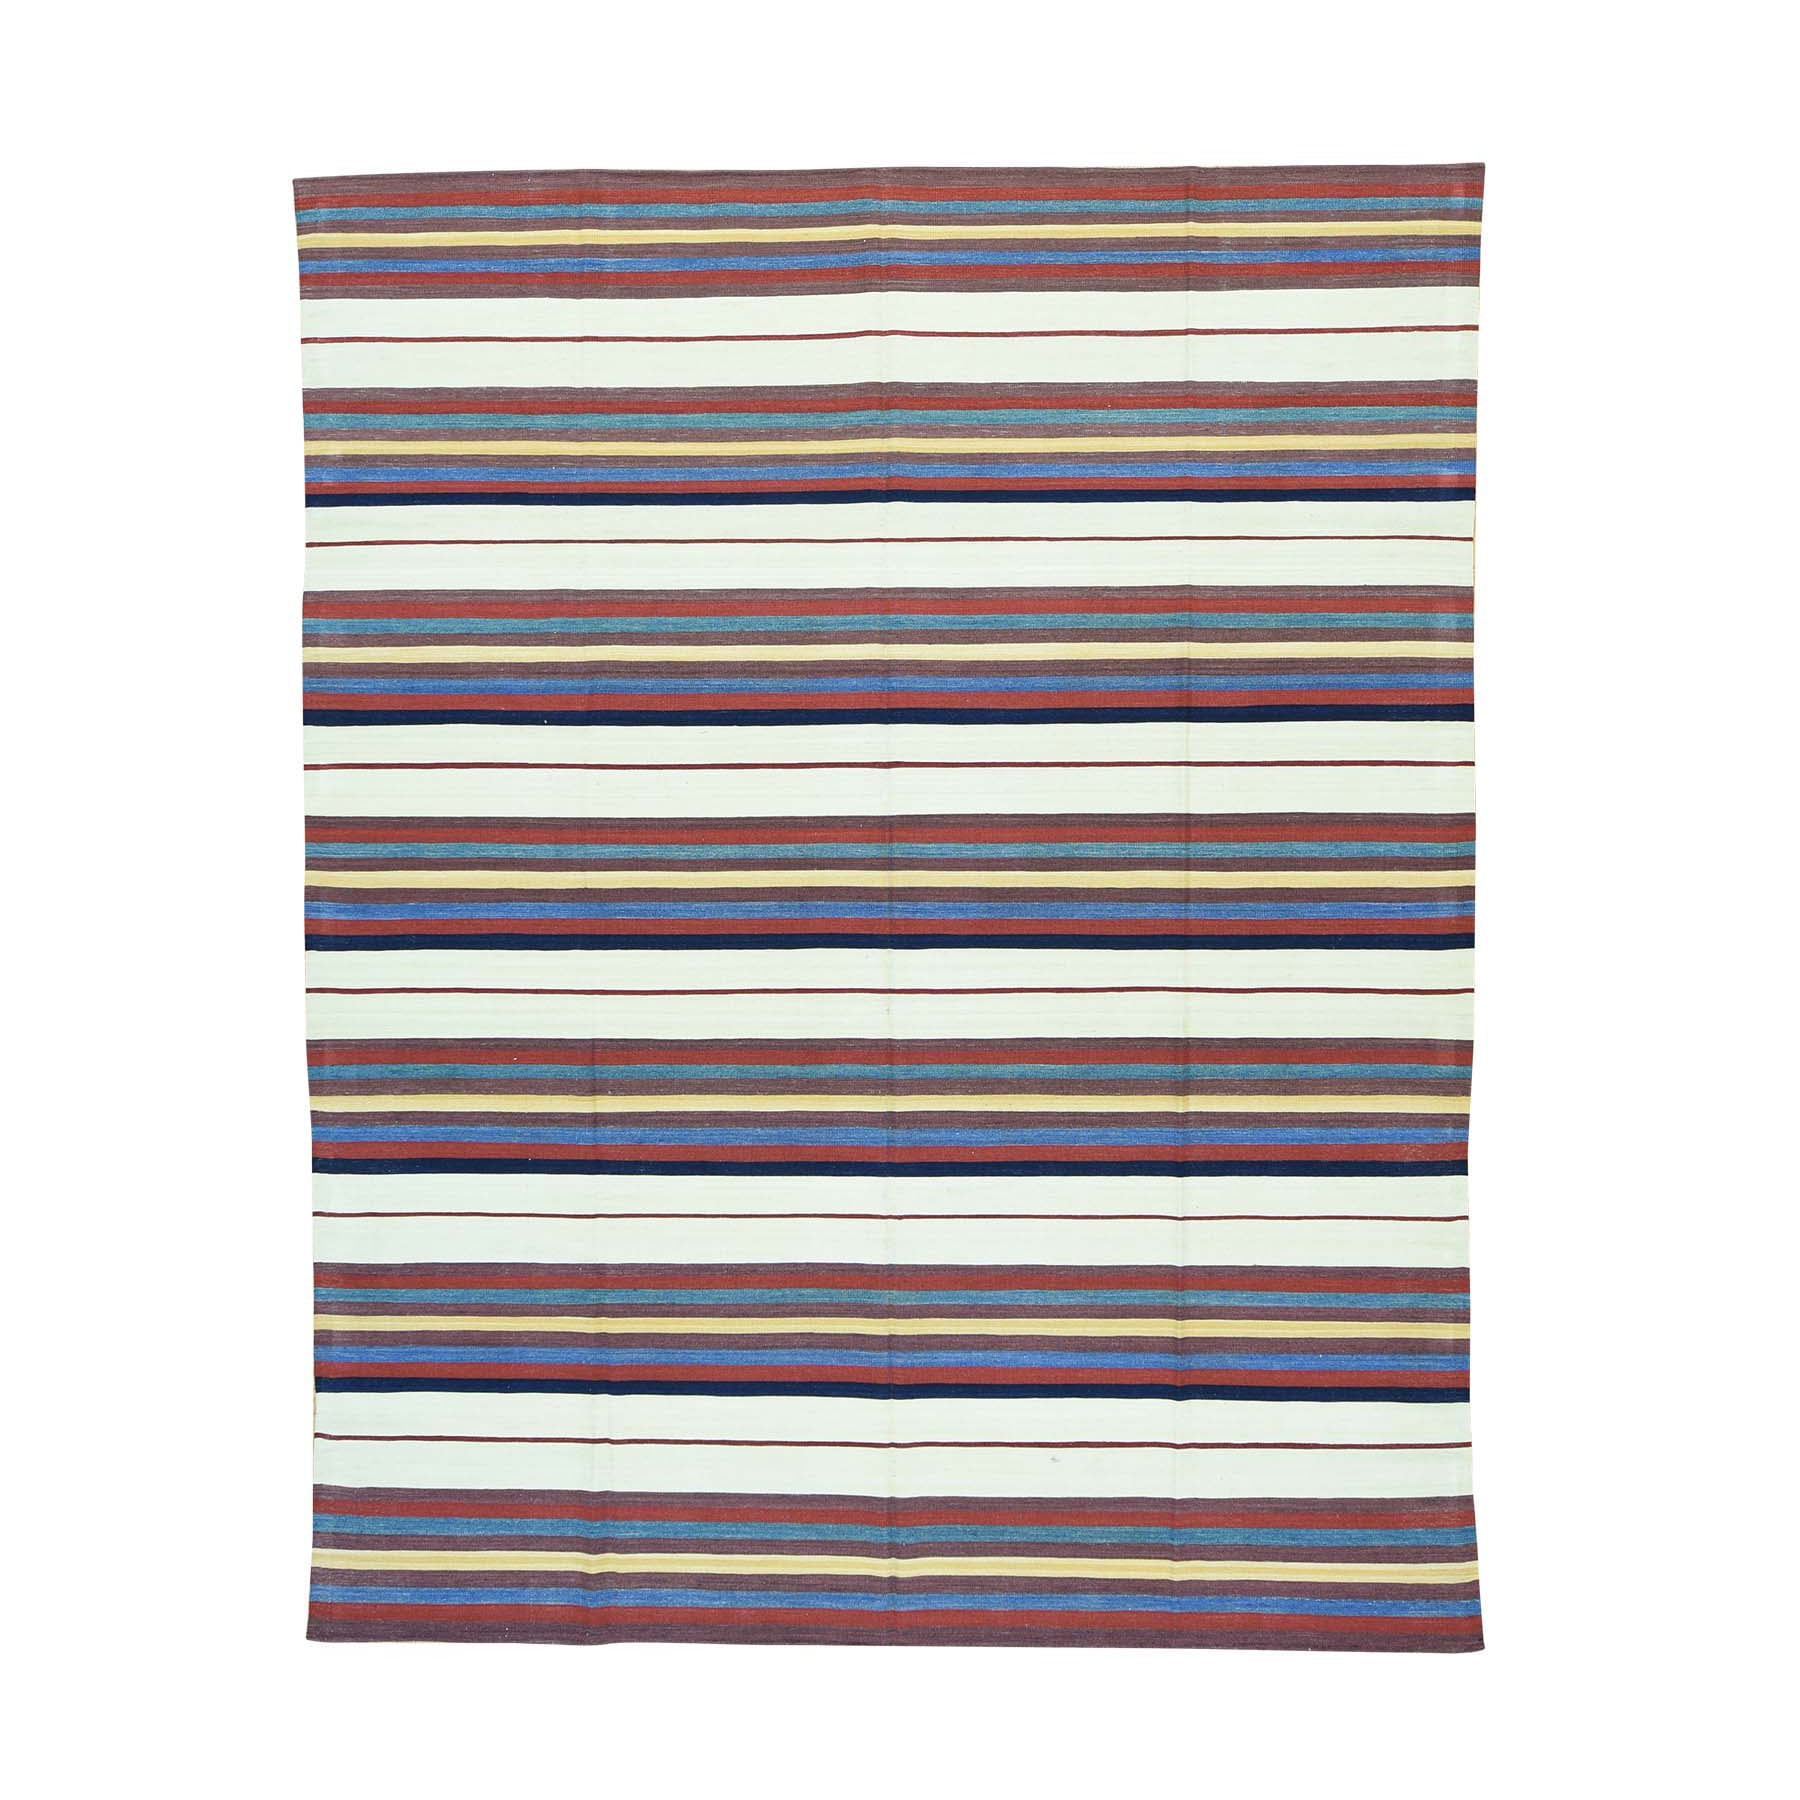 Qashqai Oriental Multicolor Wool Striped Flatweave Hand-woven Kilim Area Rug (8'3 x10'4) - Multi